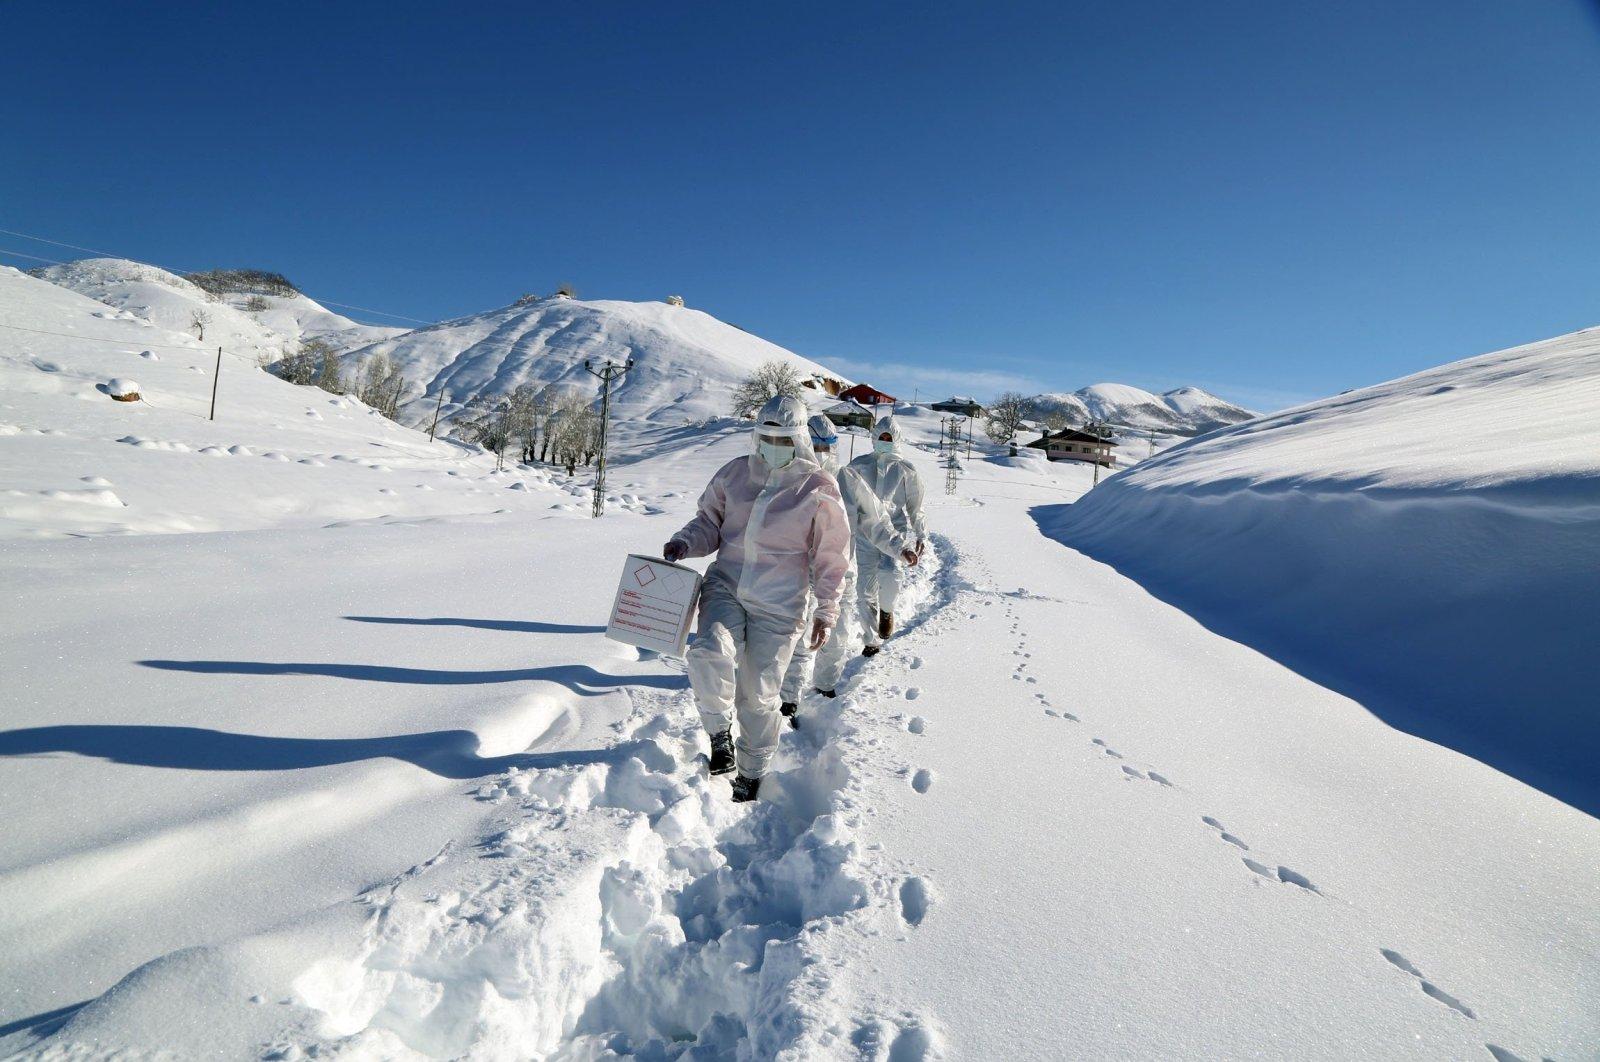 Contact-tracing crews make their way through the snow in Tunceli, eastern Turkey, Jan. 21, 2021. (DHA PHOTO)